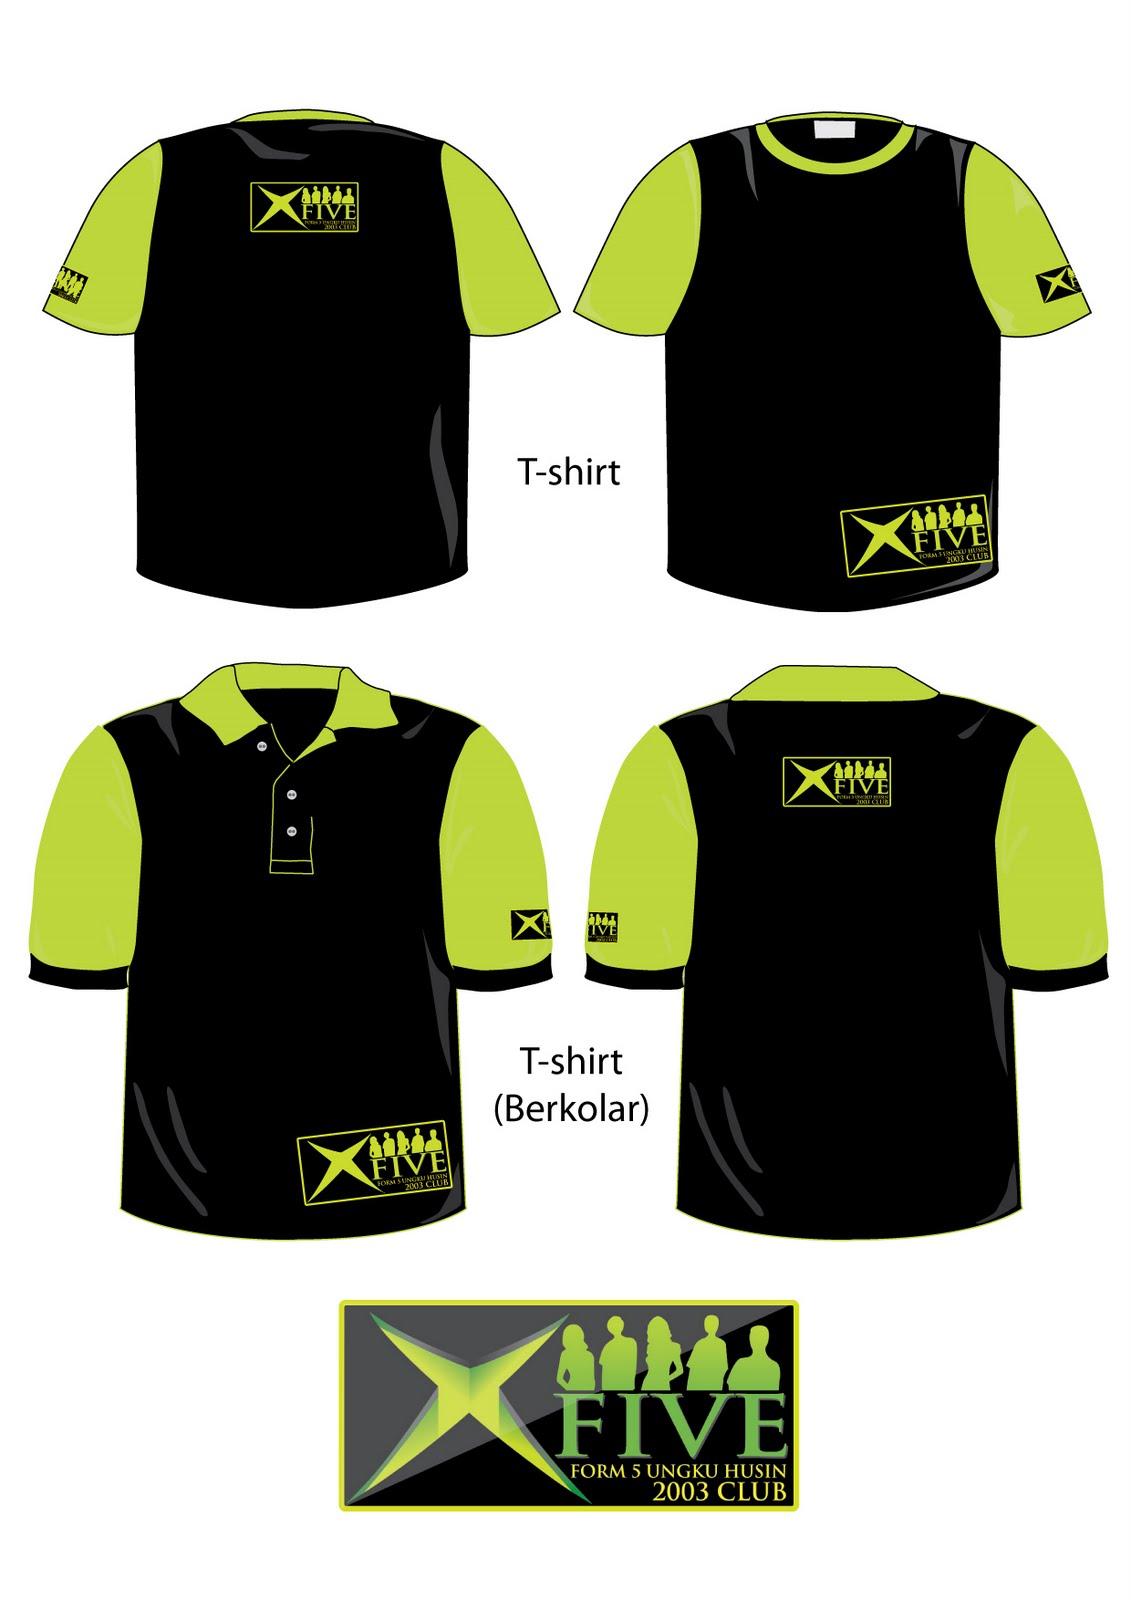 Designs contoh baju t shirt design baju berkolar shirt berkolar - Contoh Design T Shirt Kelab X5 Smkuh Design A Design B